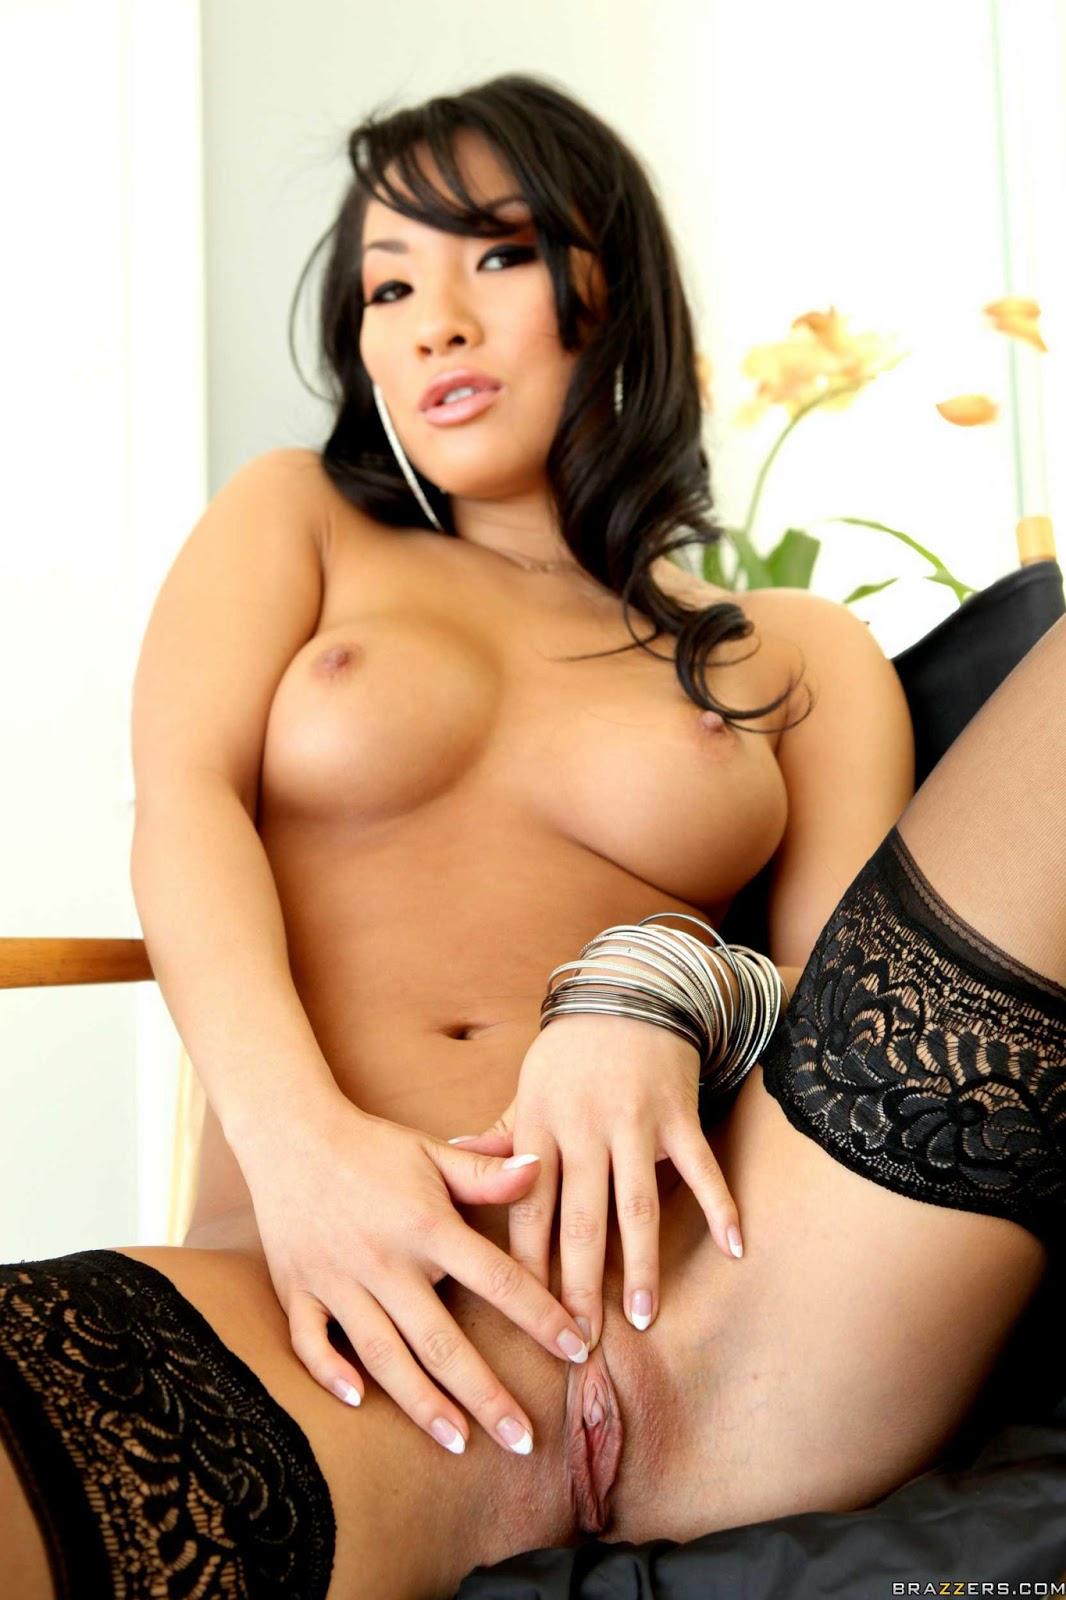 Азиатка порно актриса, домашние порно фото русских сучек